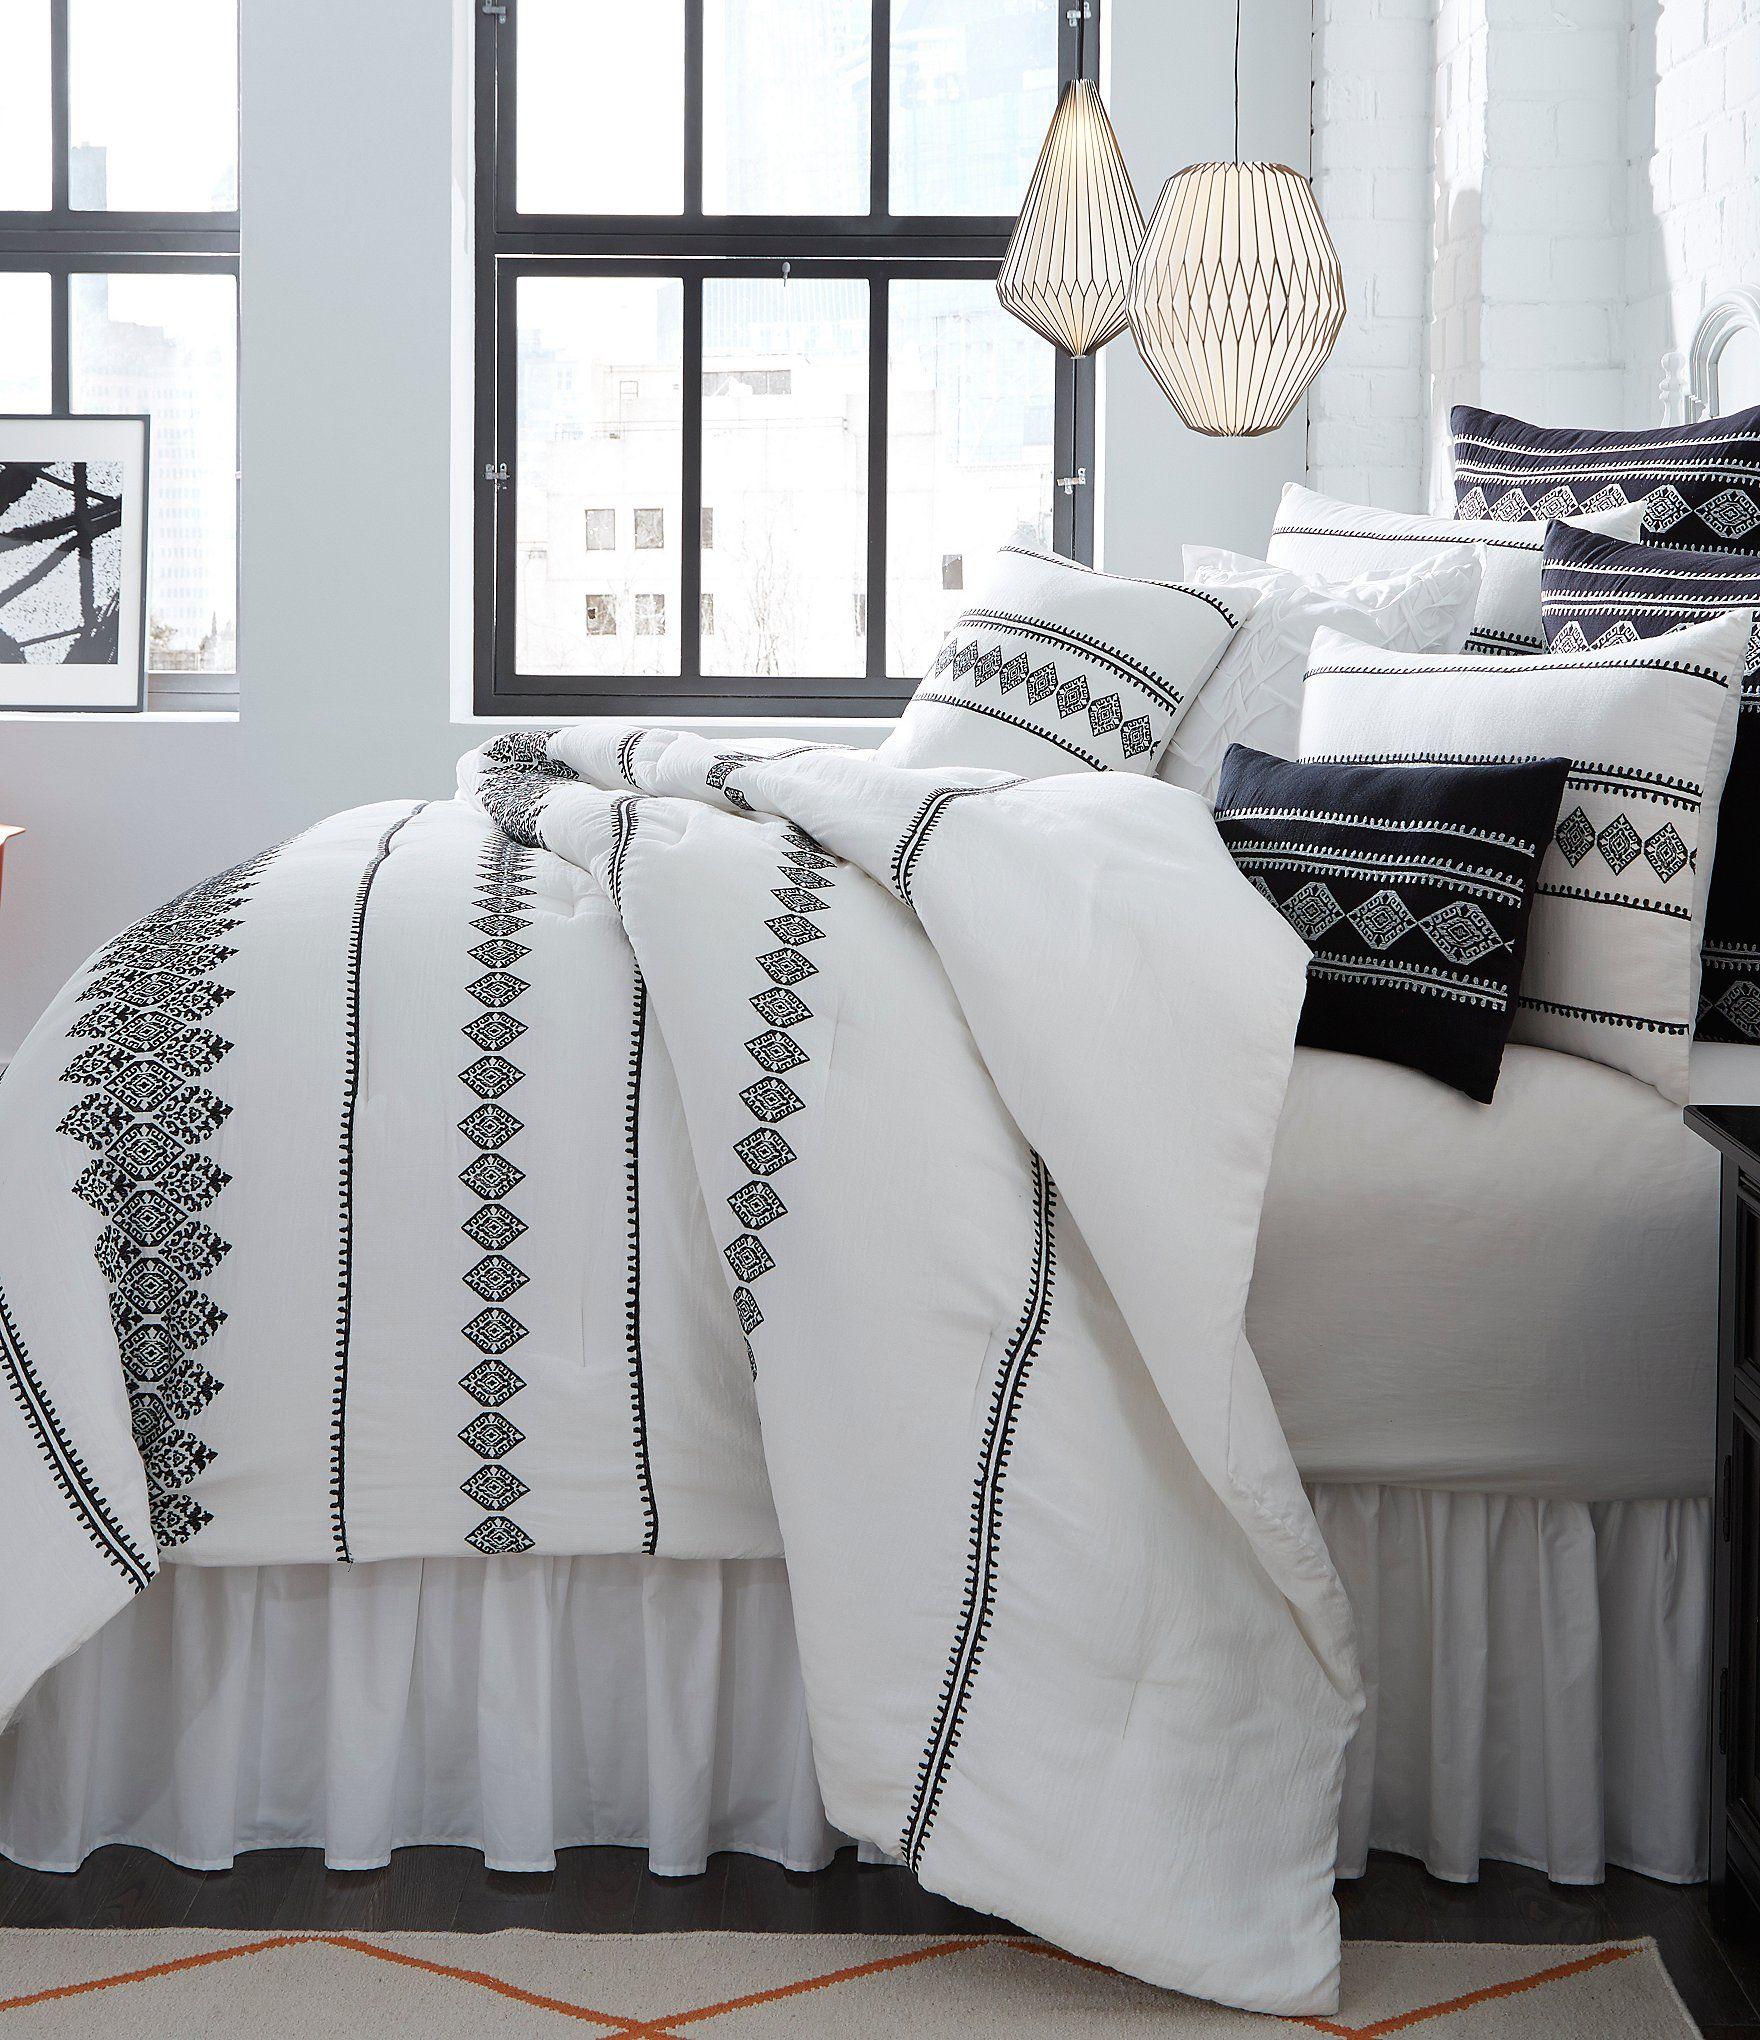 Shop for Studio D Tevin Tribal Embroidered Comforter Mini Set at